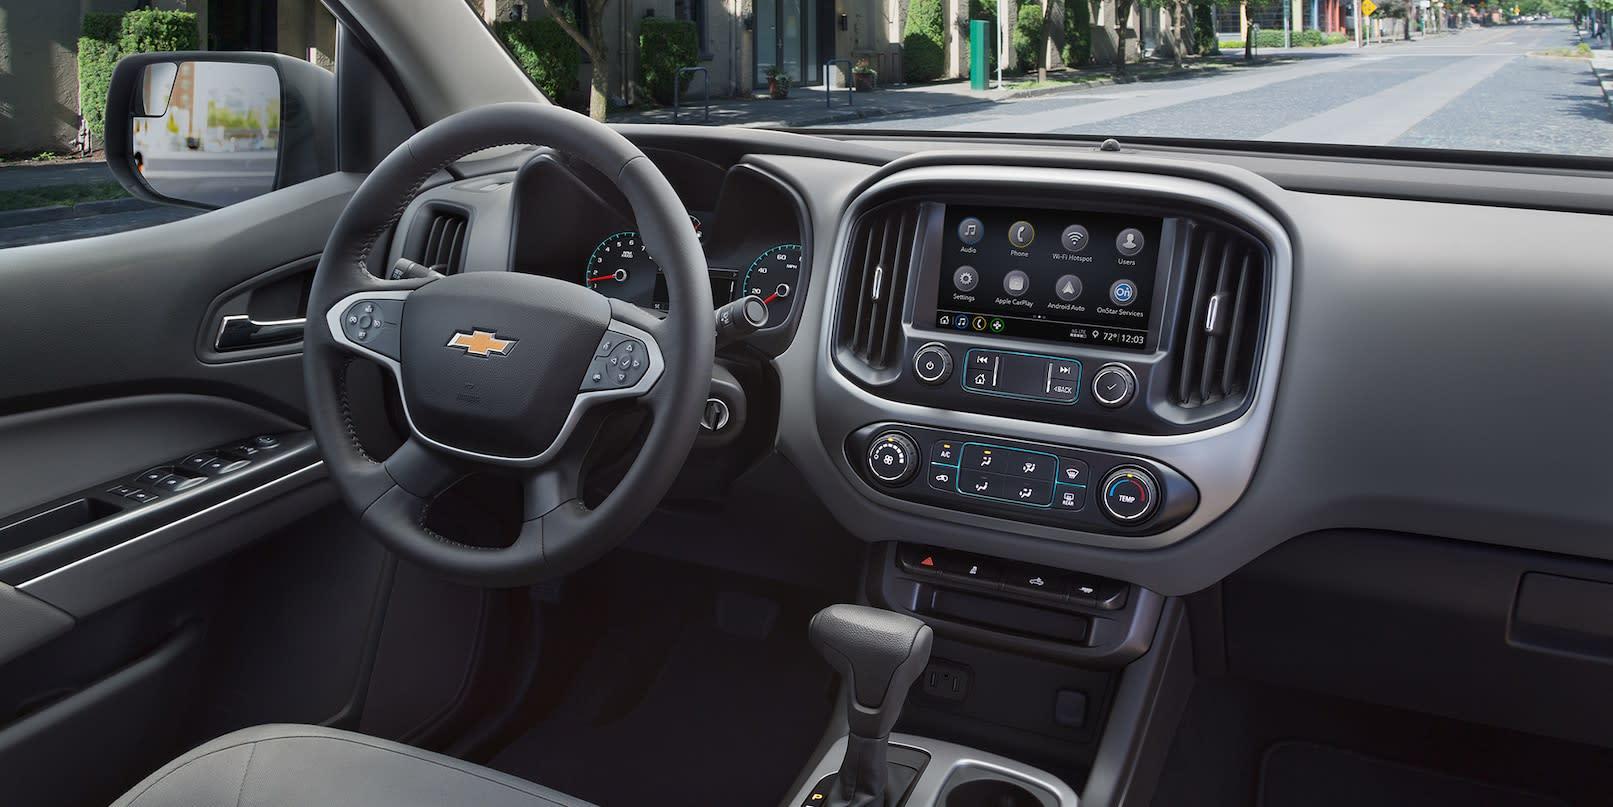 Tech-Loaded Interior of the 2019 Chevrolet Colorado